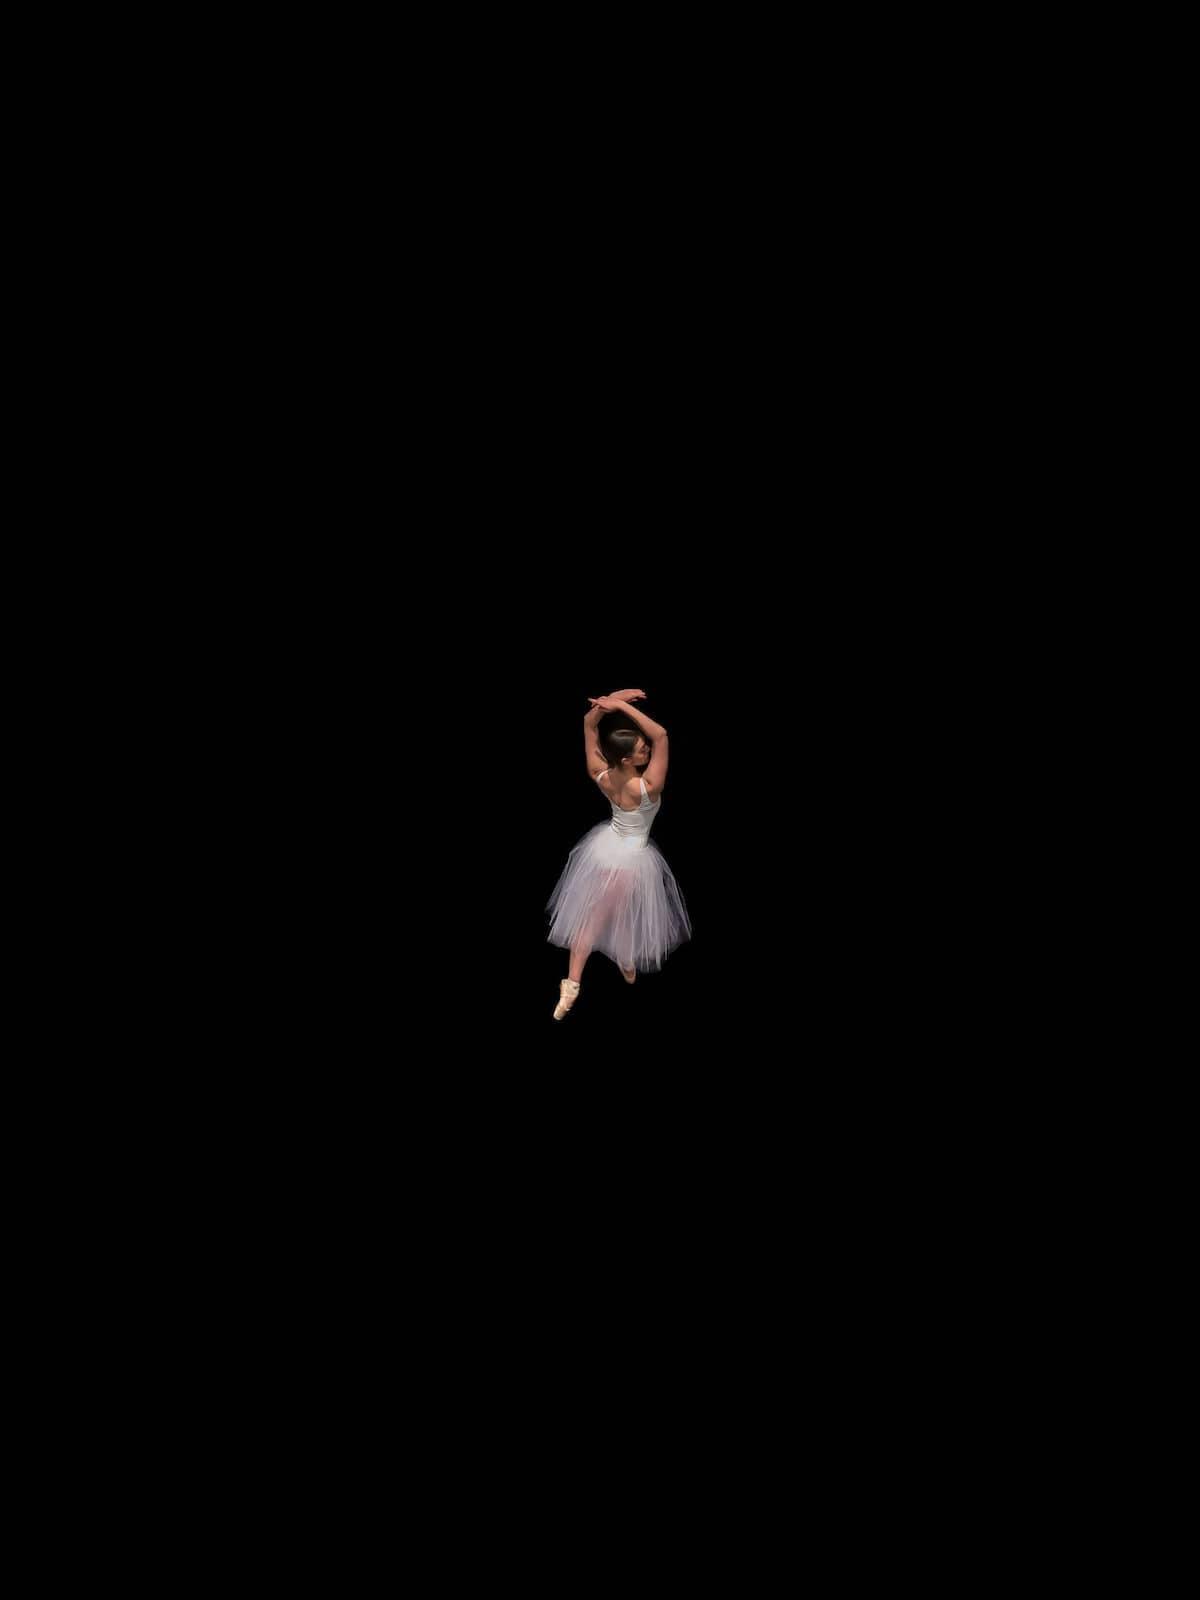 Aerial Photo of a Ballerina